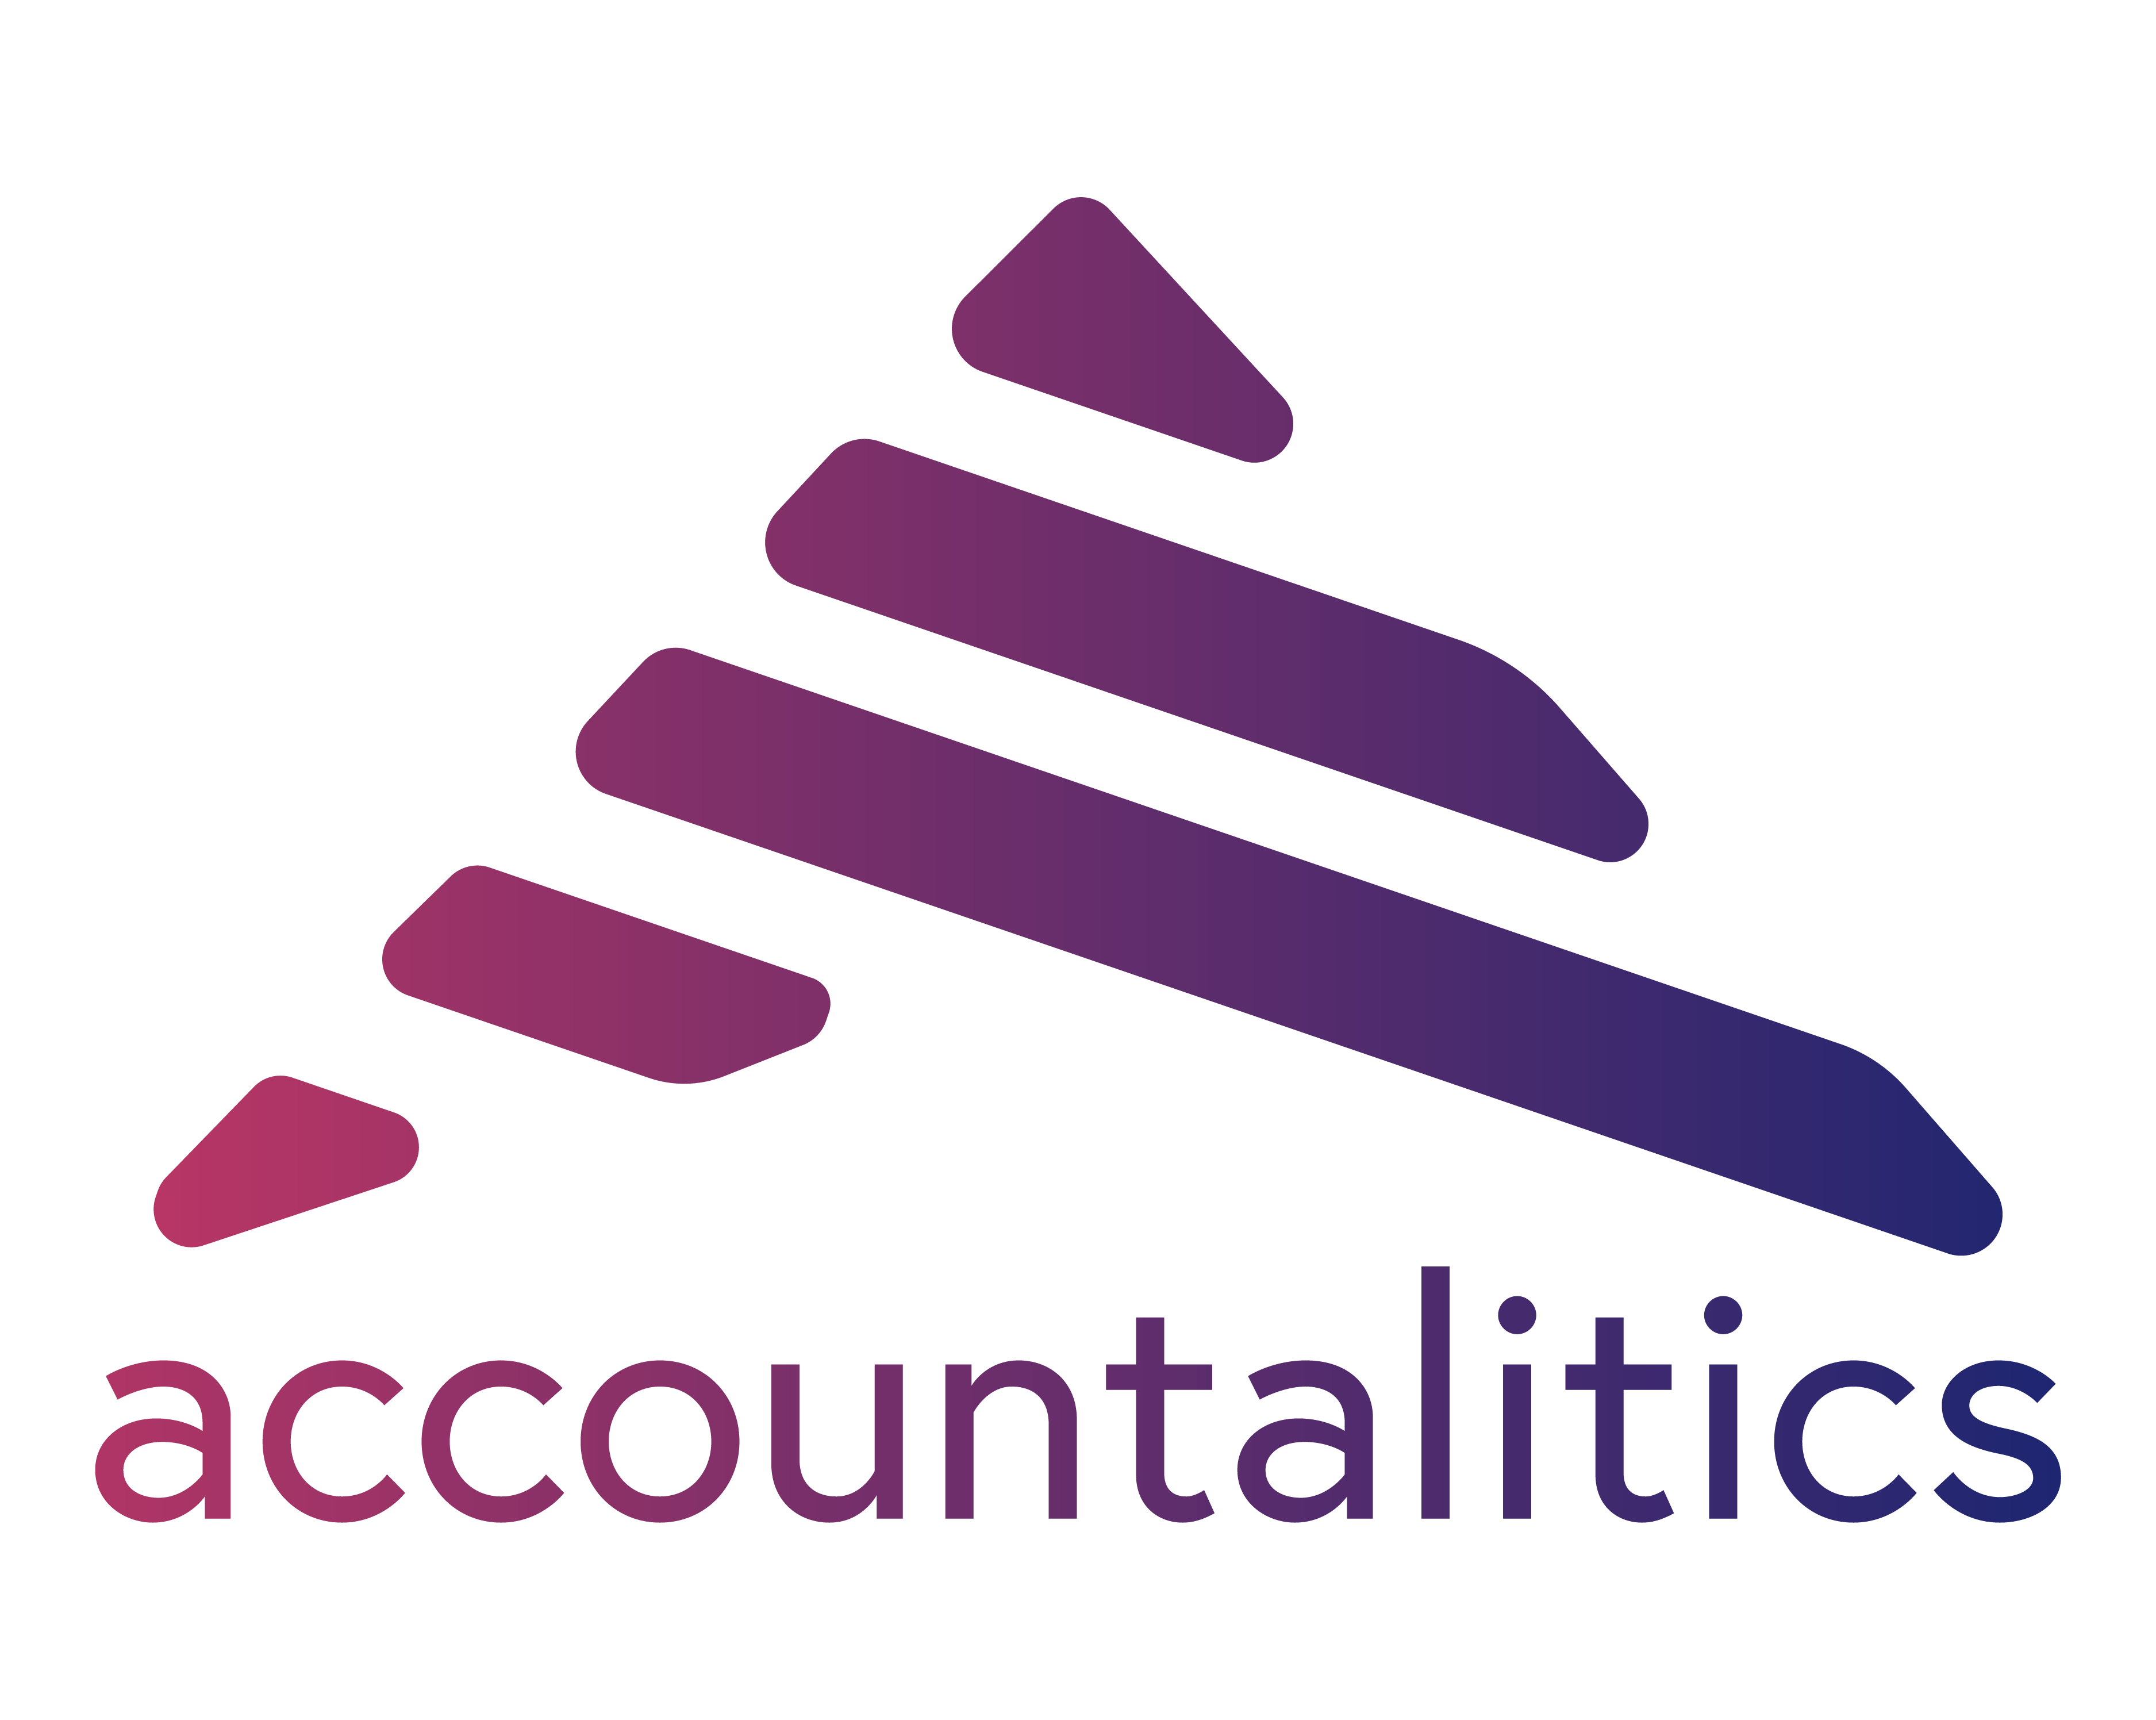 accountalitics ltd